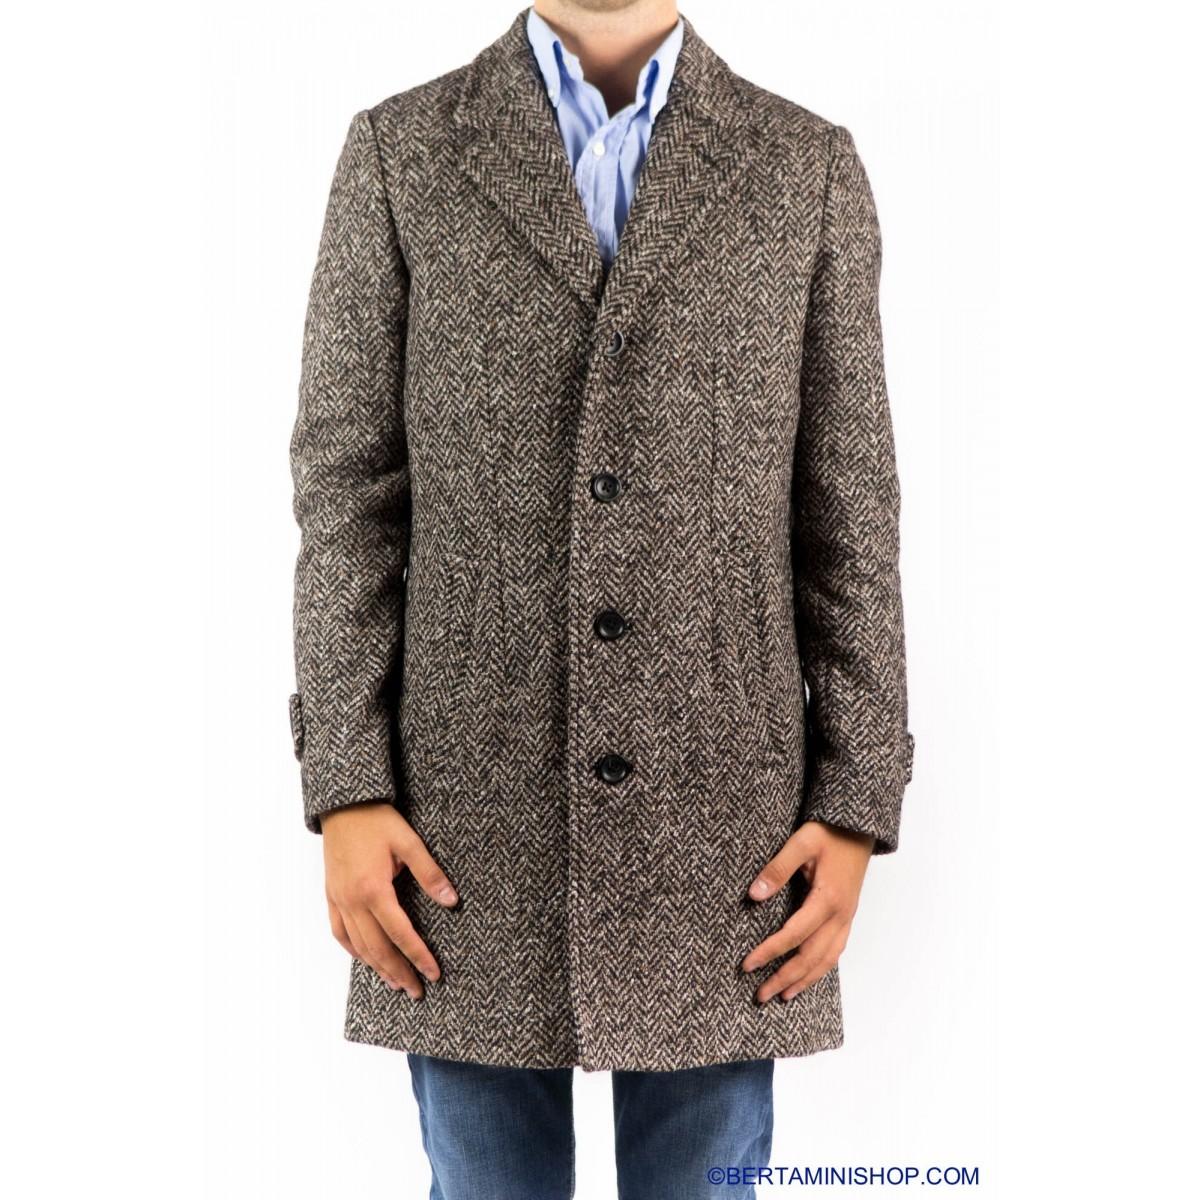 Cappotto Paltò Italia Uomo - Geraldo N M008 - Nocciola spinato